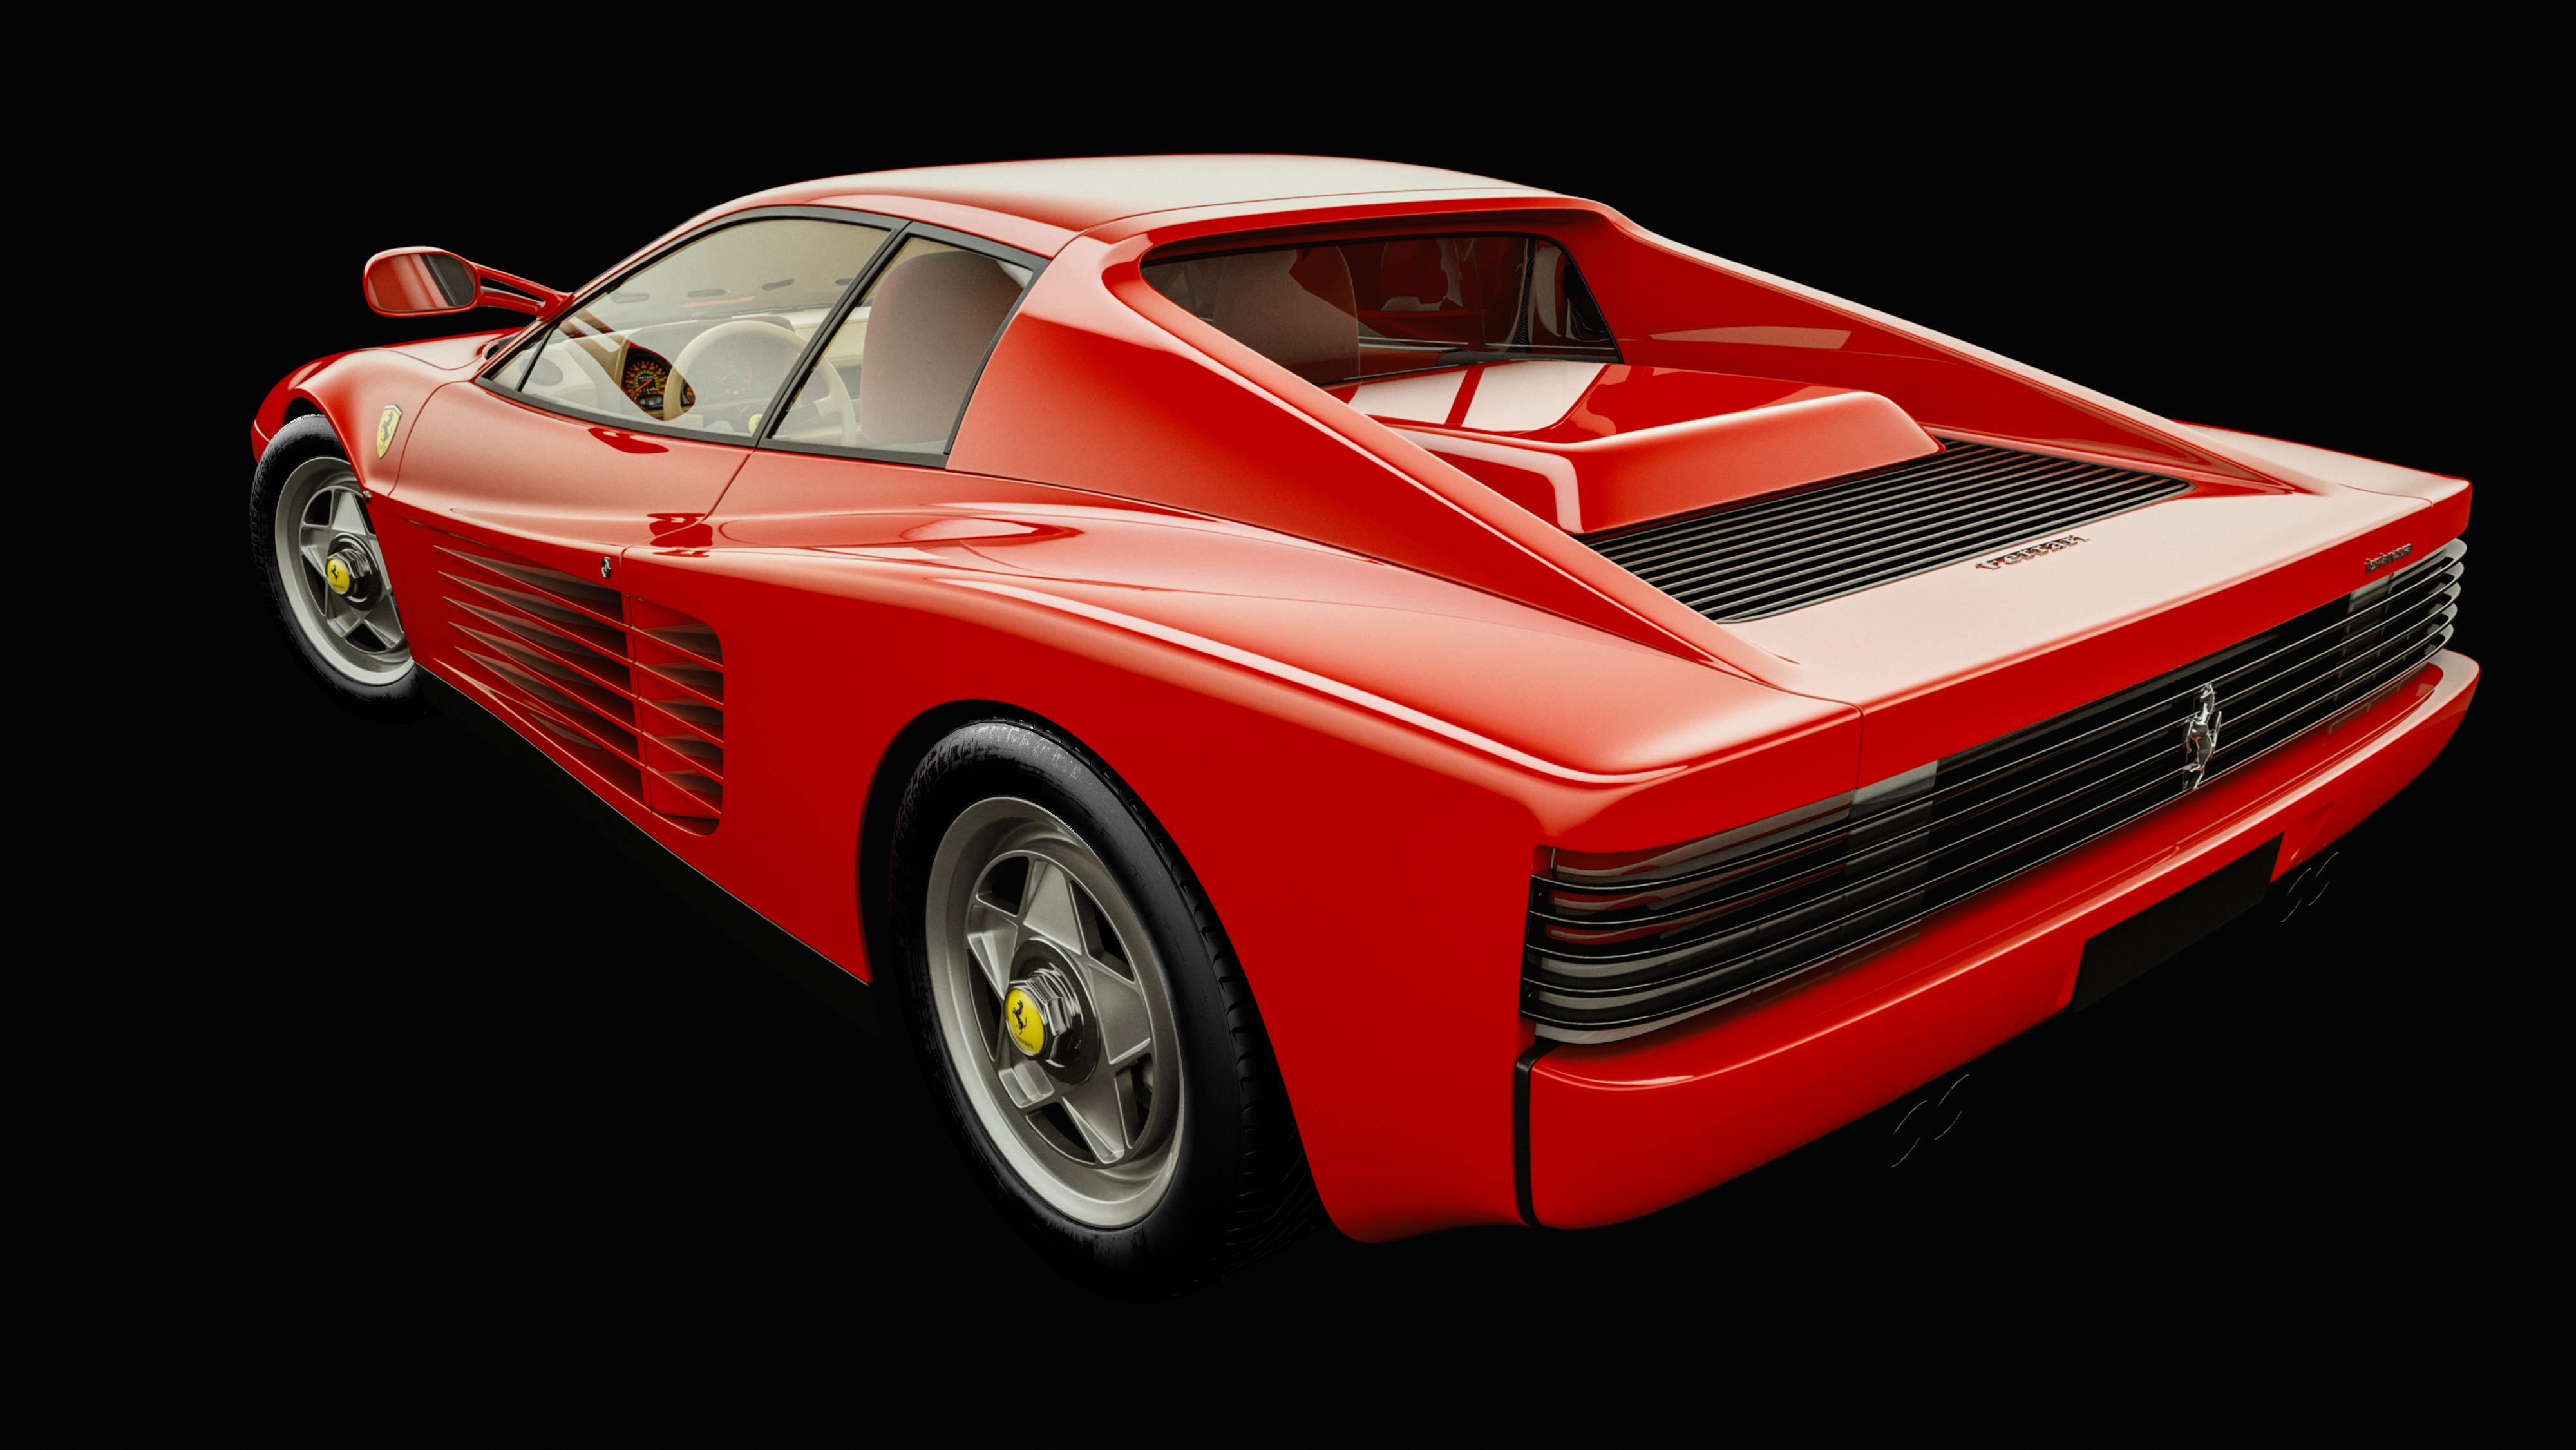 Ferrari Testarossa 1984 By Laffonte On Deviantart